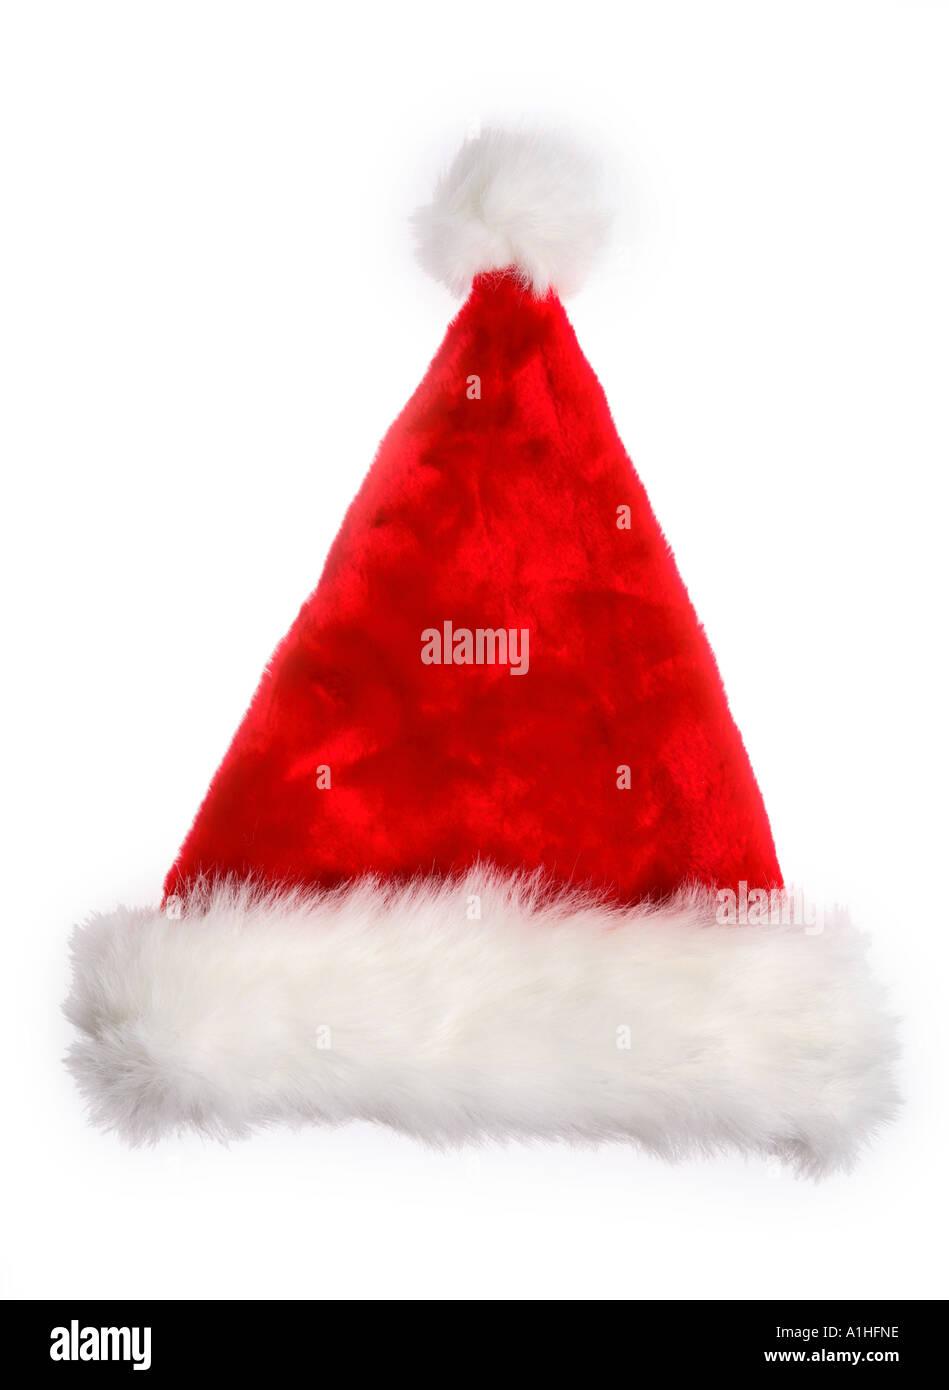 Santa Claus hat - Stock Image